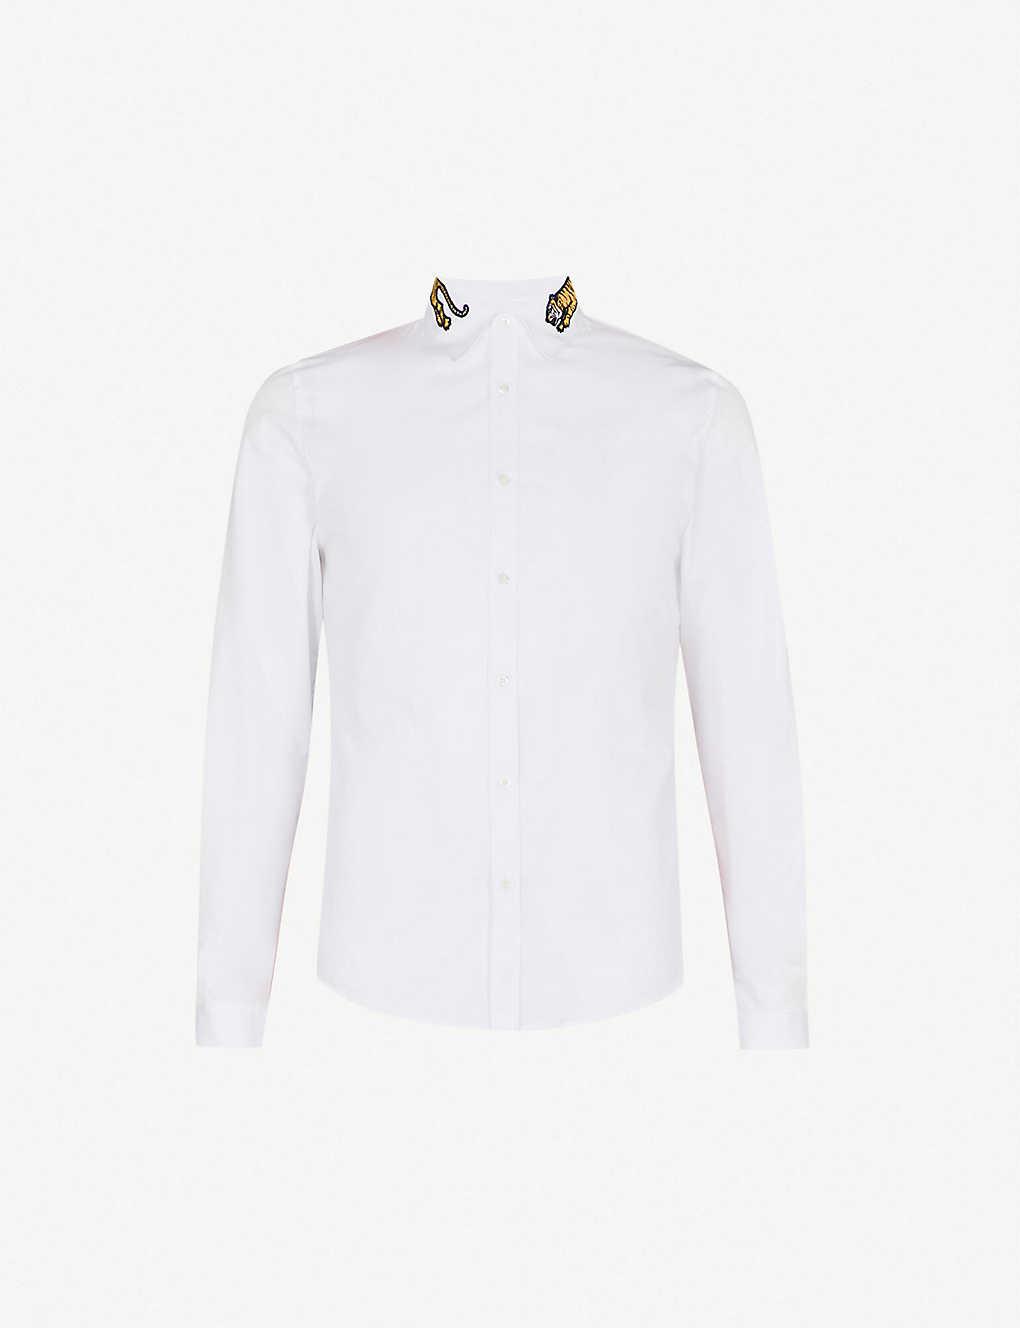 7ebb2f80 ... Duke tiger-embroidered regular-fit cotton-poplin shirt zoom ...